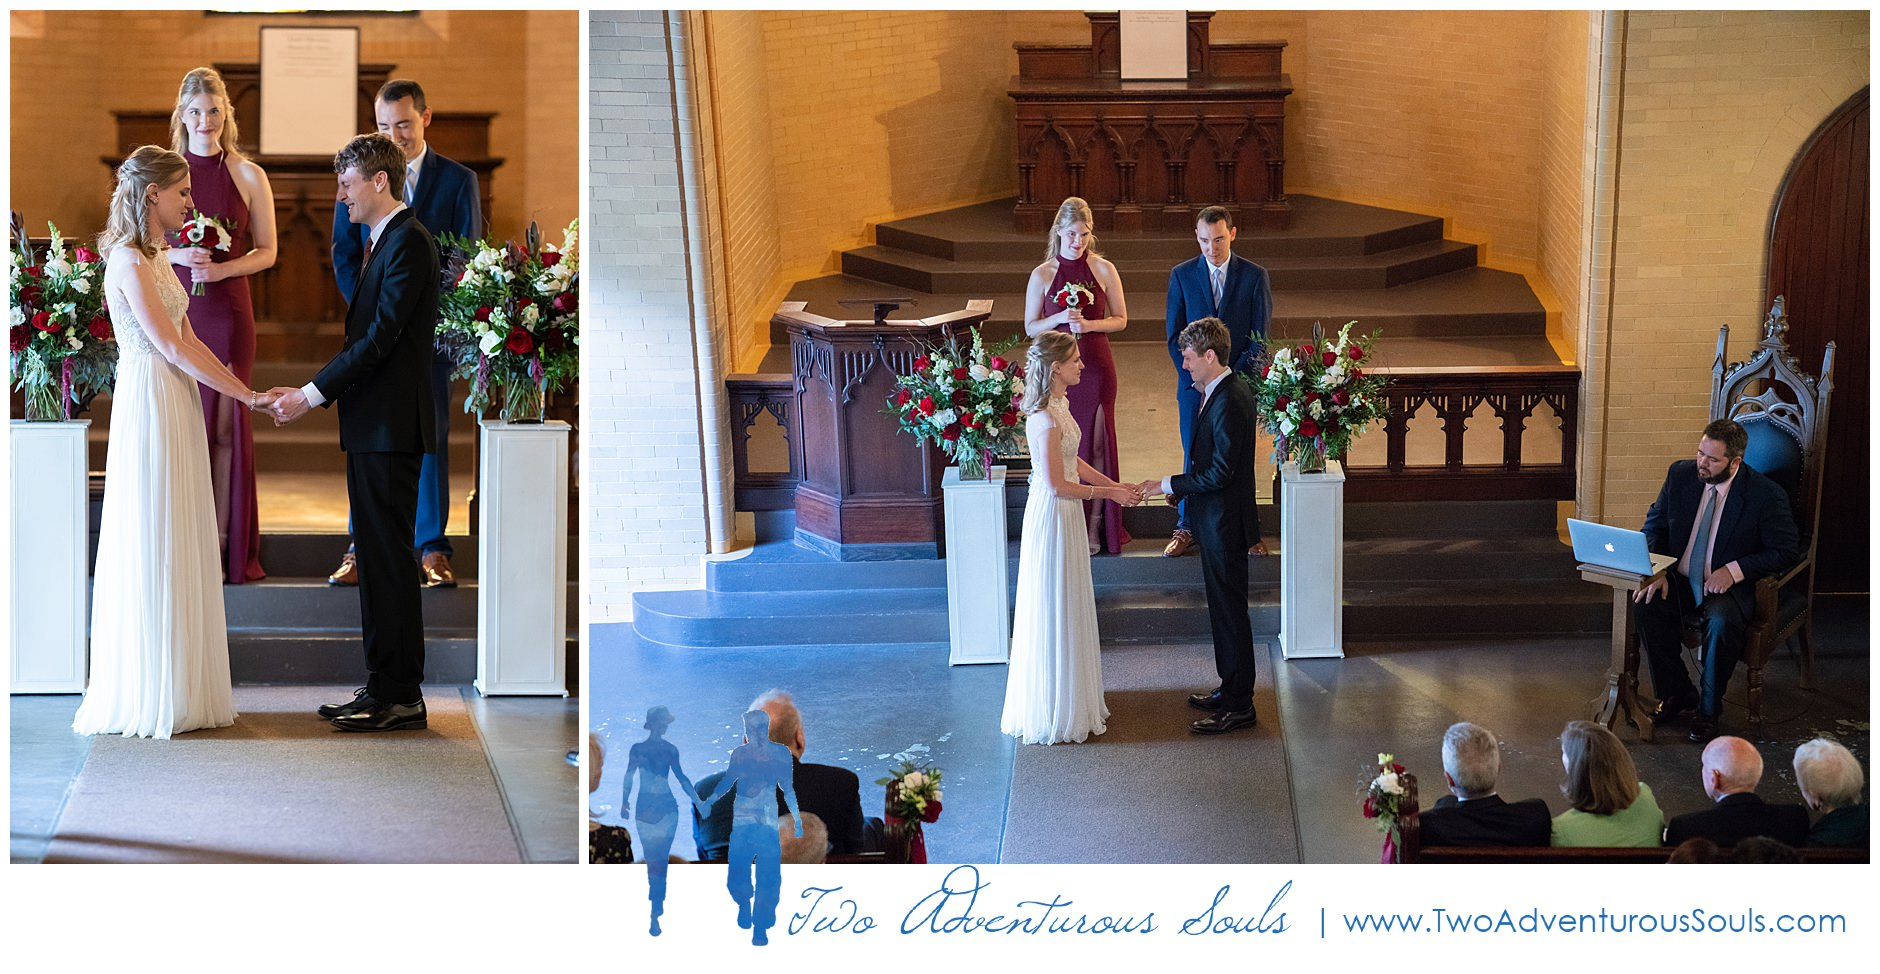 Grace Maine Photographers, Portland Maine Wedding Photographers, Two Adventurous Souls- 090719_0021.jpg